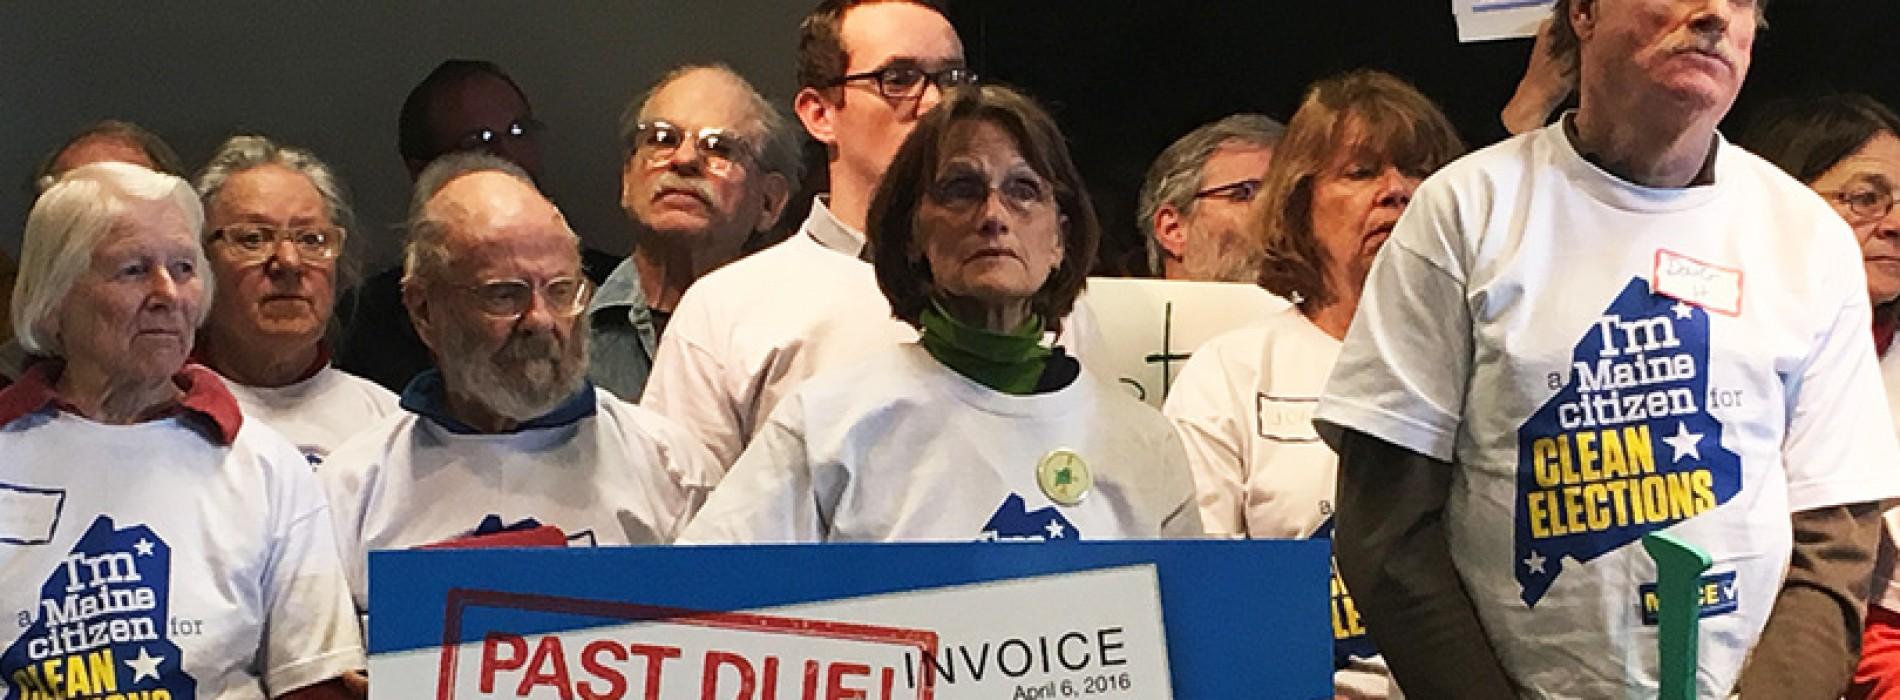 Maine Senate Republicans defy Clean Elections referendum, protect offshore tax havens